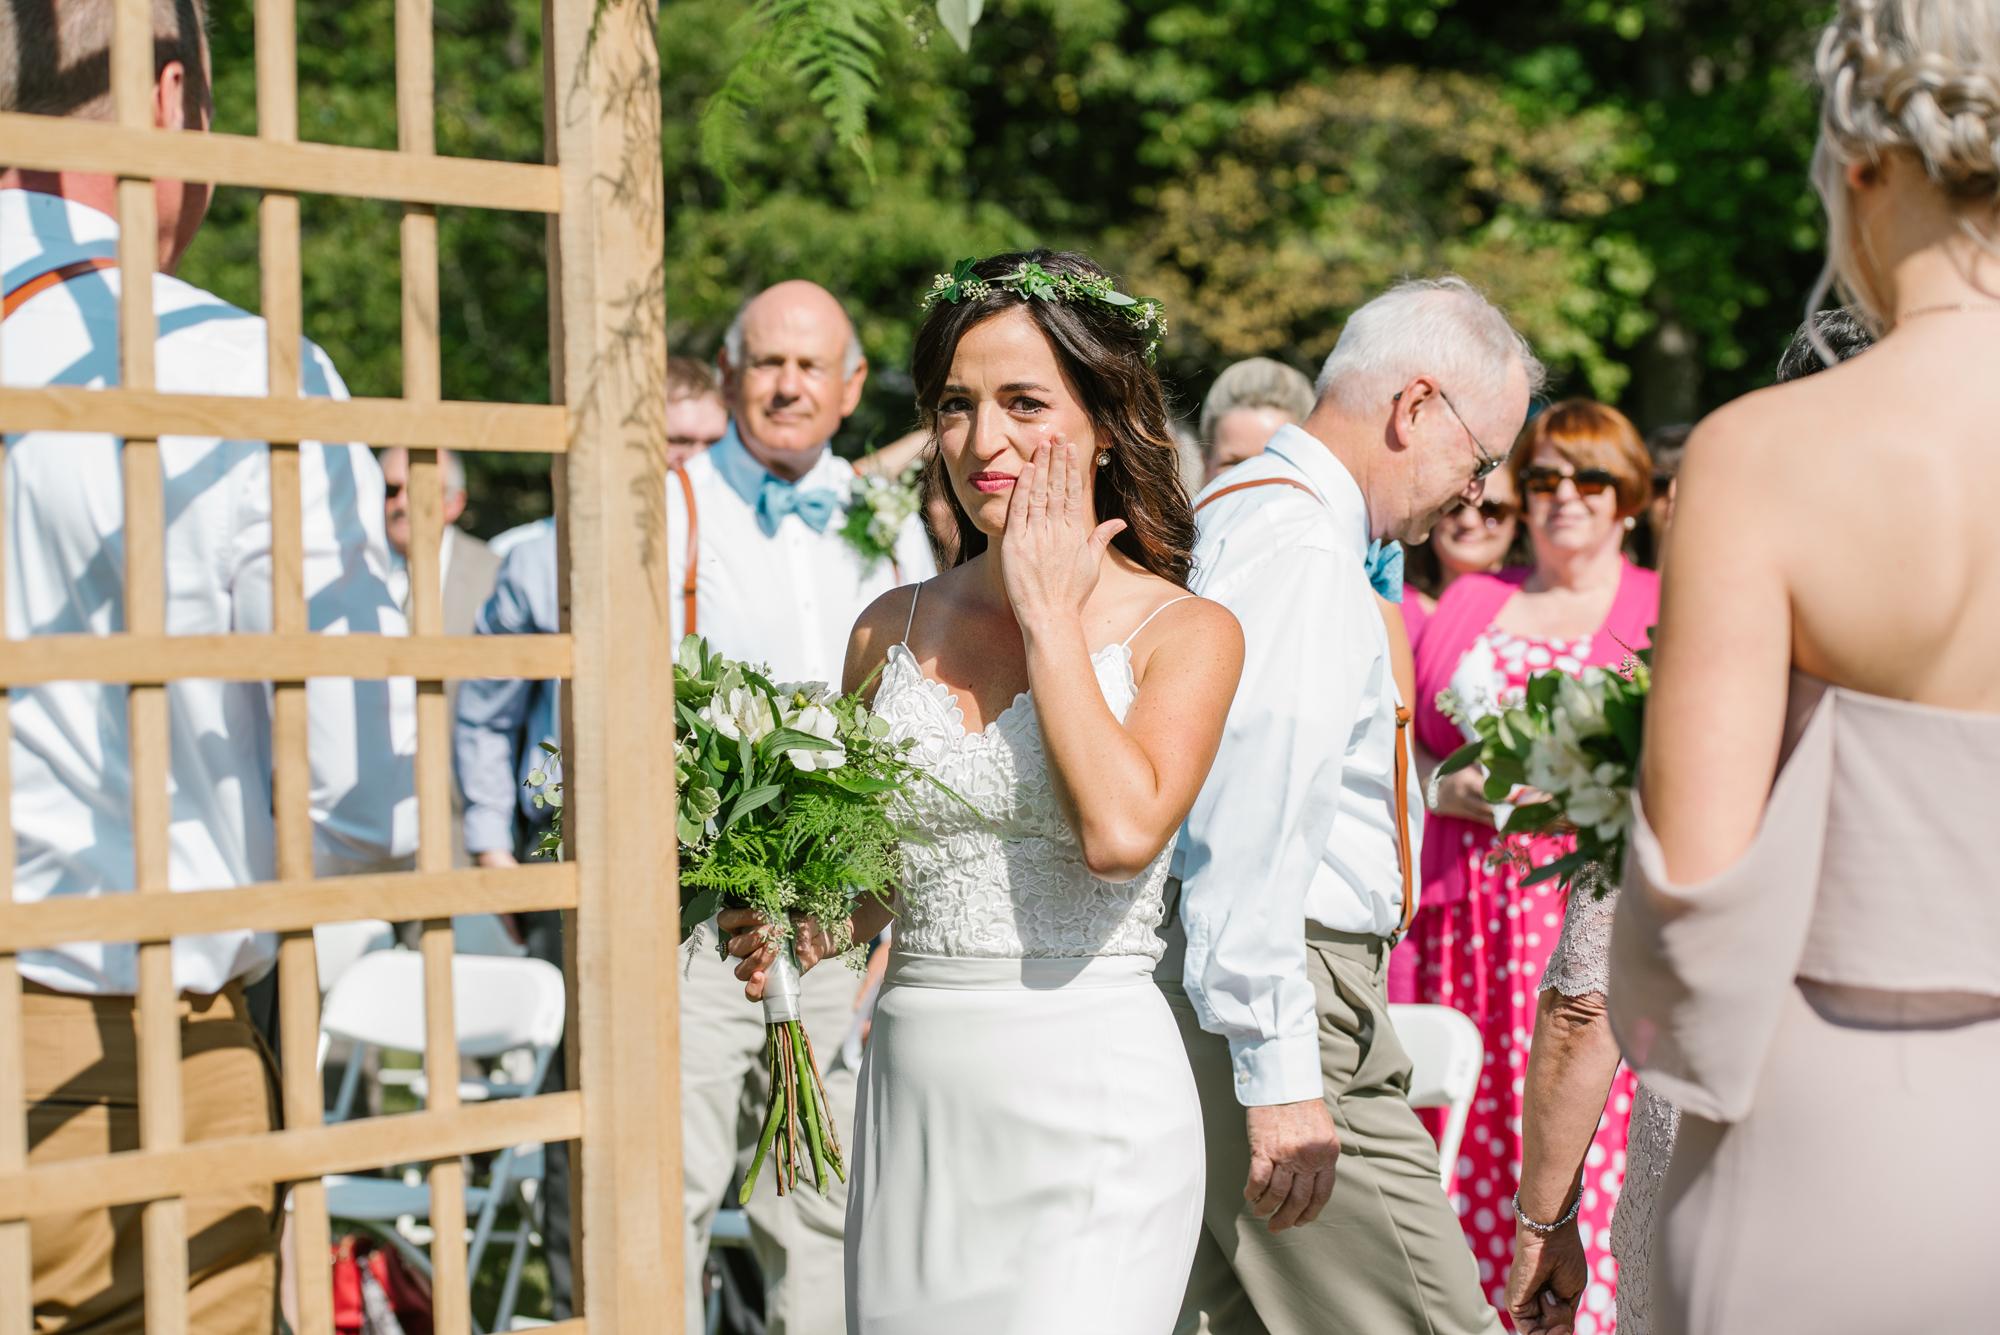 Quincy-Coldwater-Michigan-farm-wedding-photogapher-sydney-marie (90).jpg